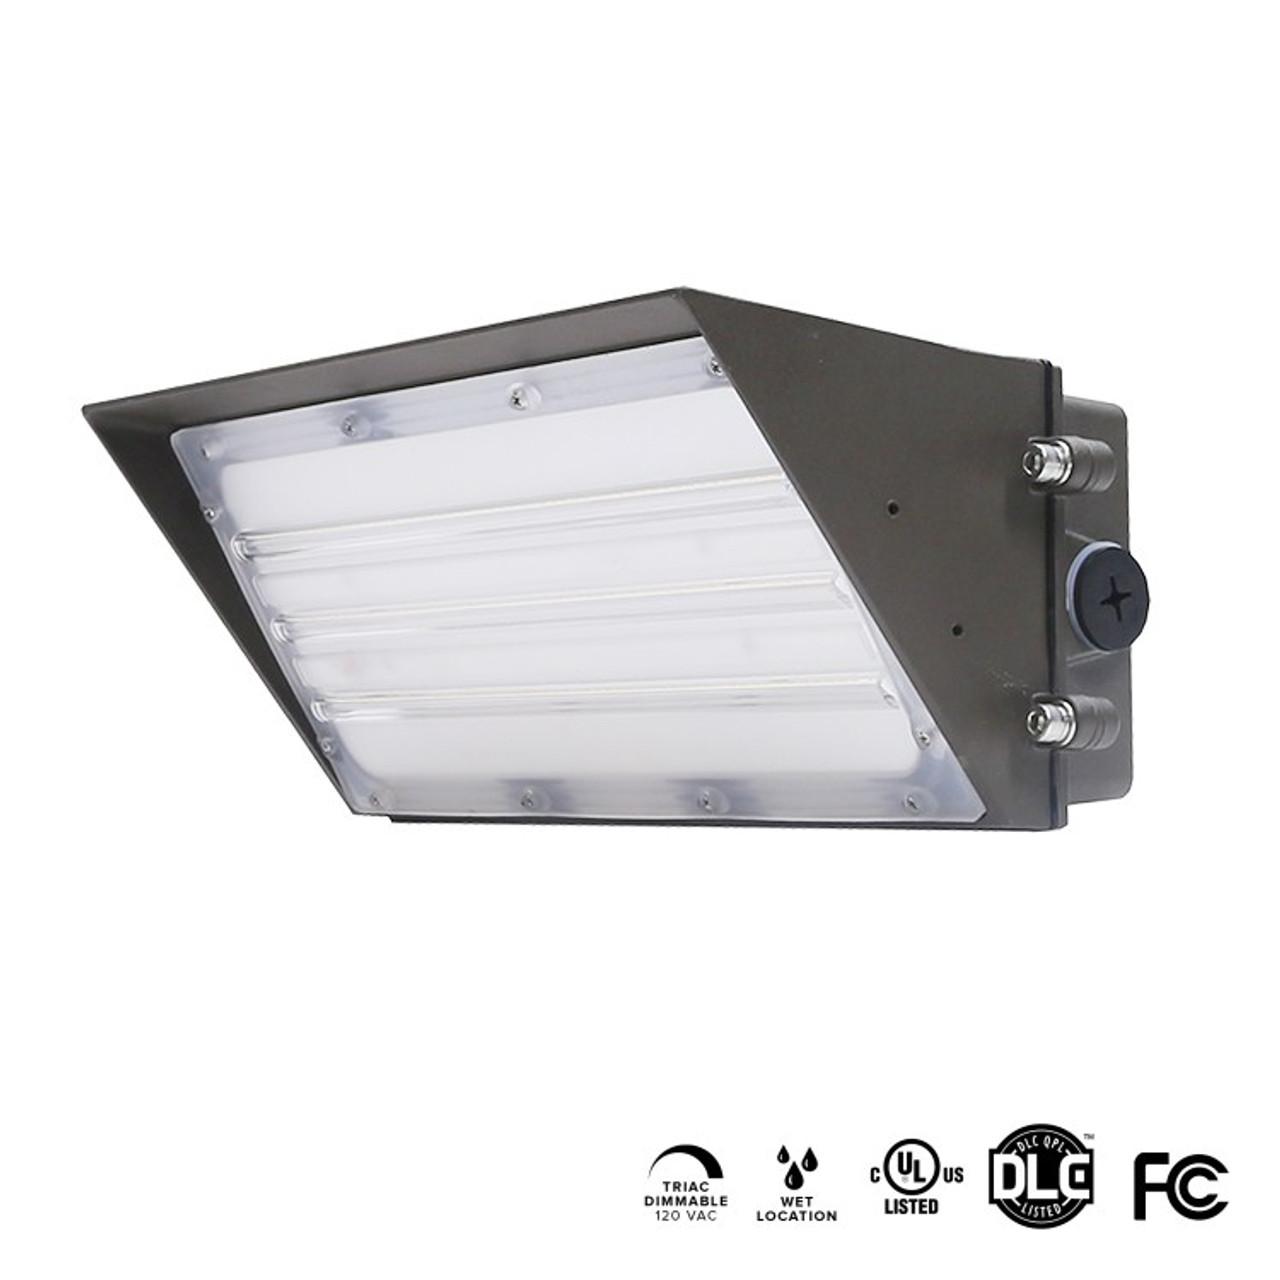 Led wall pack lights semi cut off 60w 7875 lumen 5000k led wall pack lights semi cut off 60w 7875 lumen 5000k aloadofball Choice Image